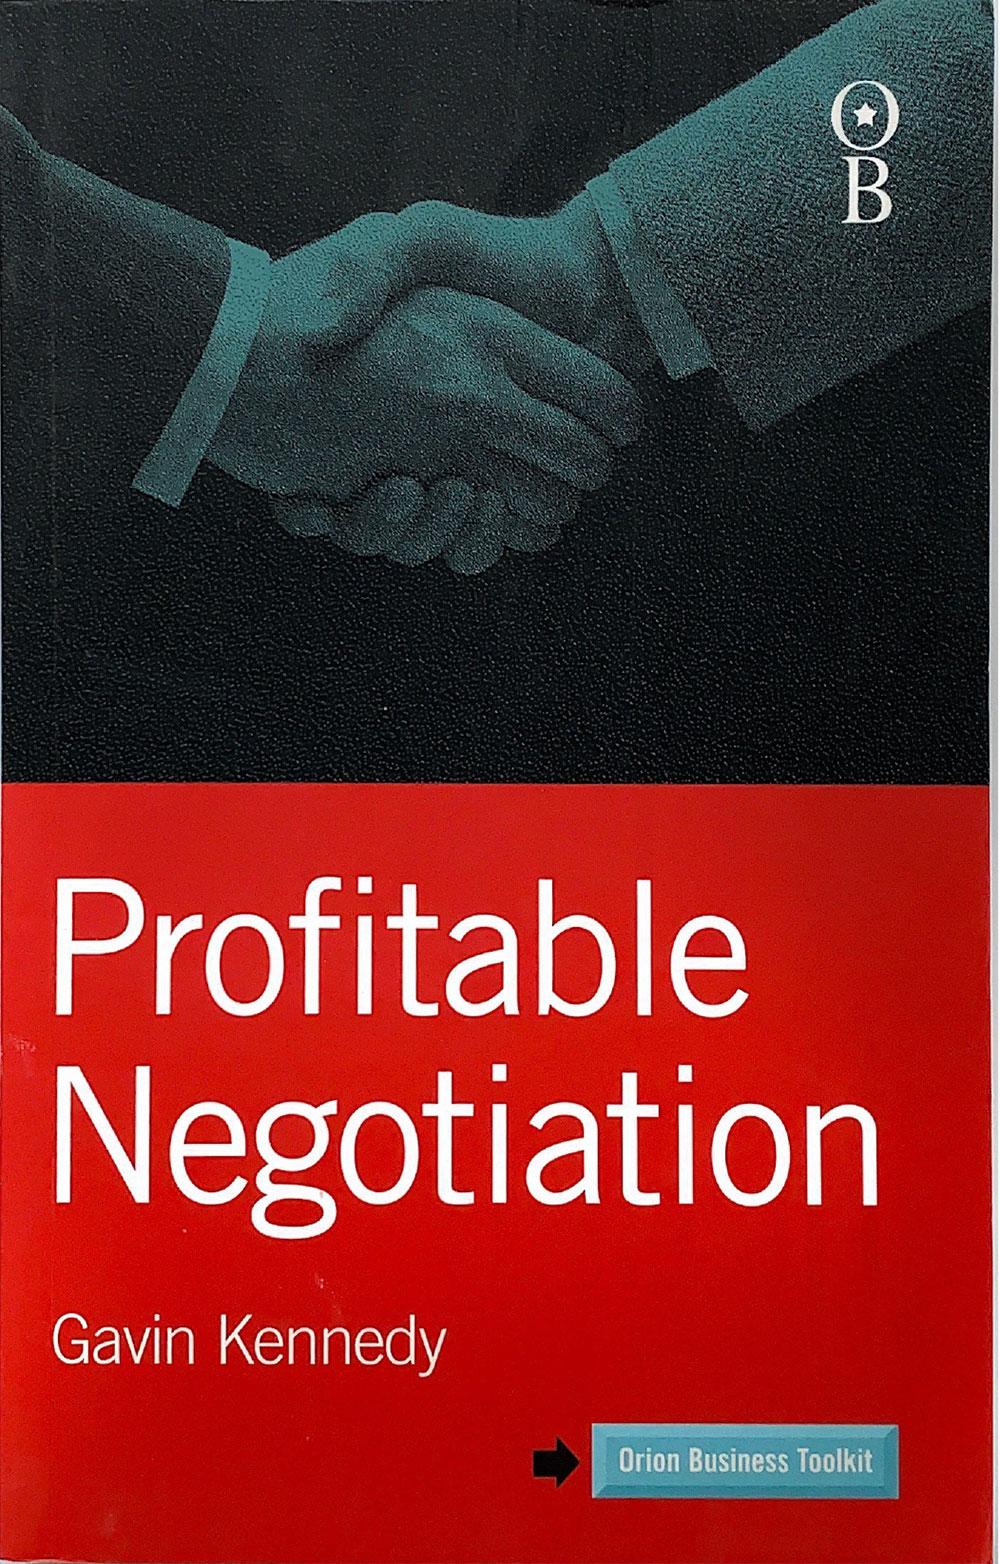 Profitable Negotiation Book by Gavin Kennedy